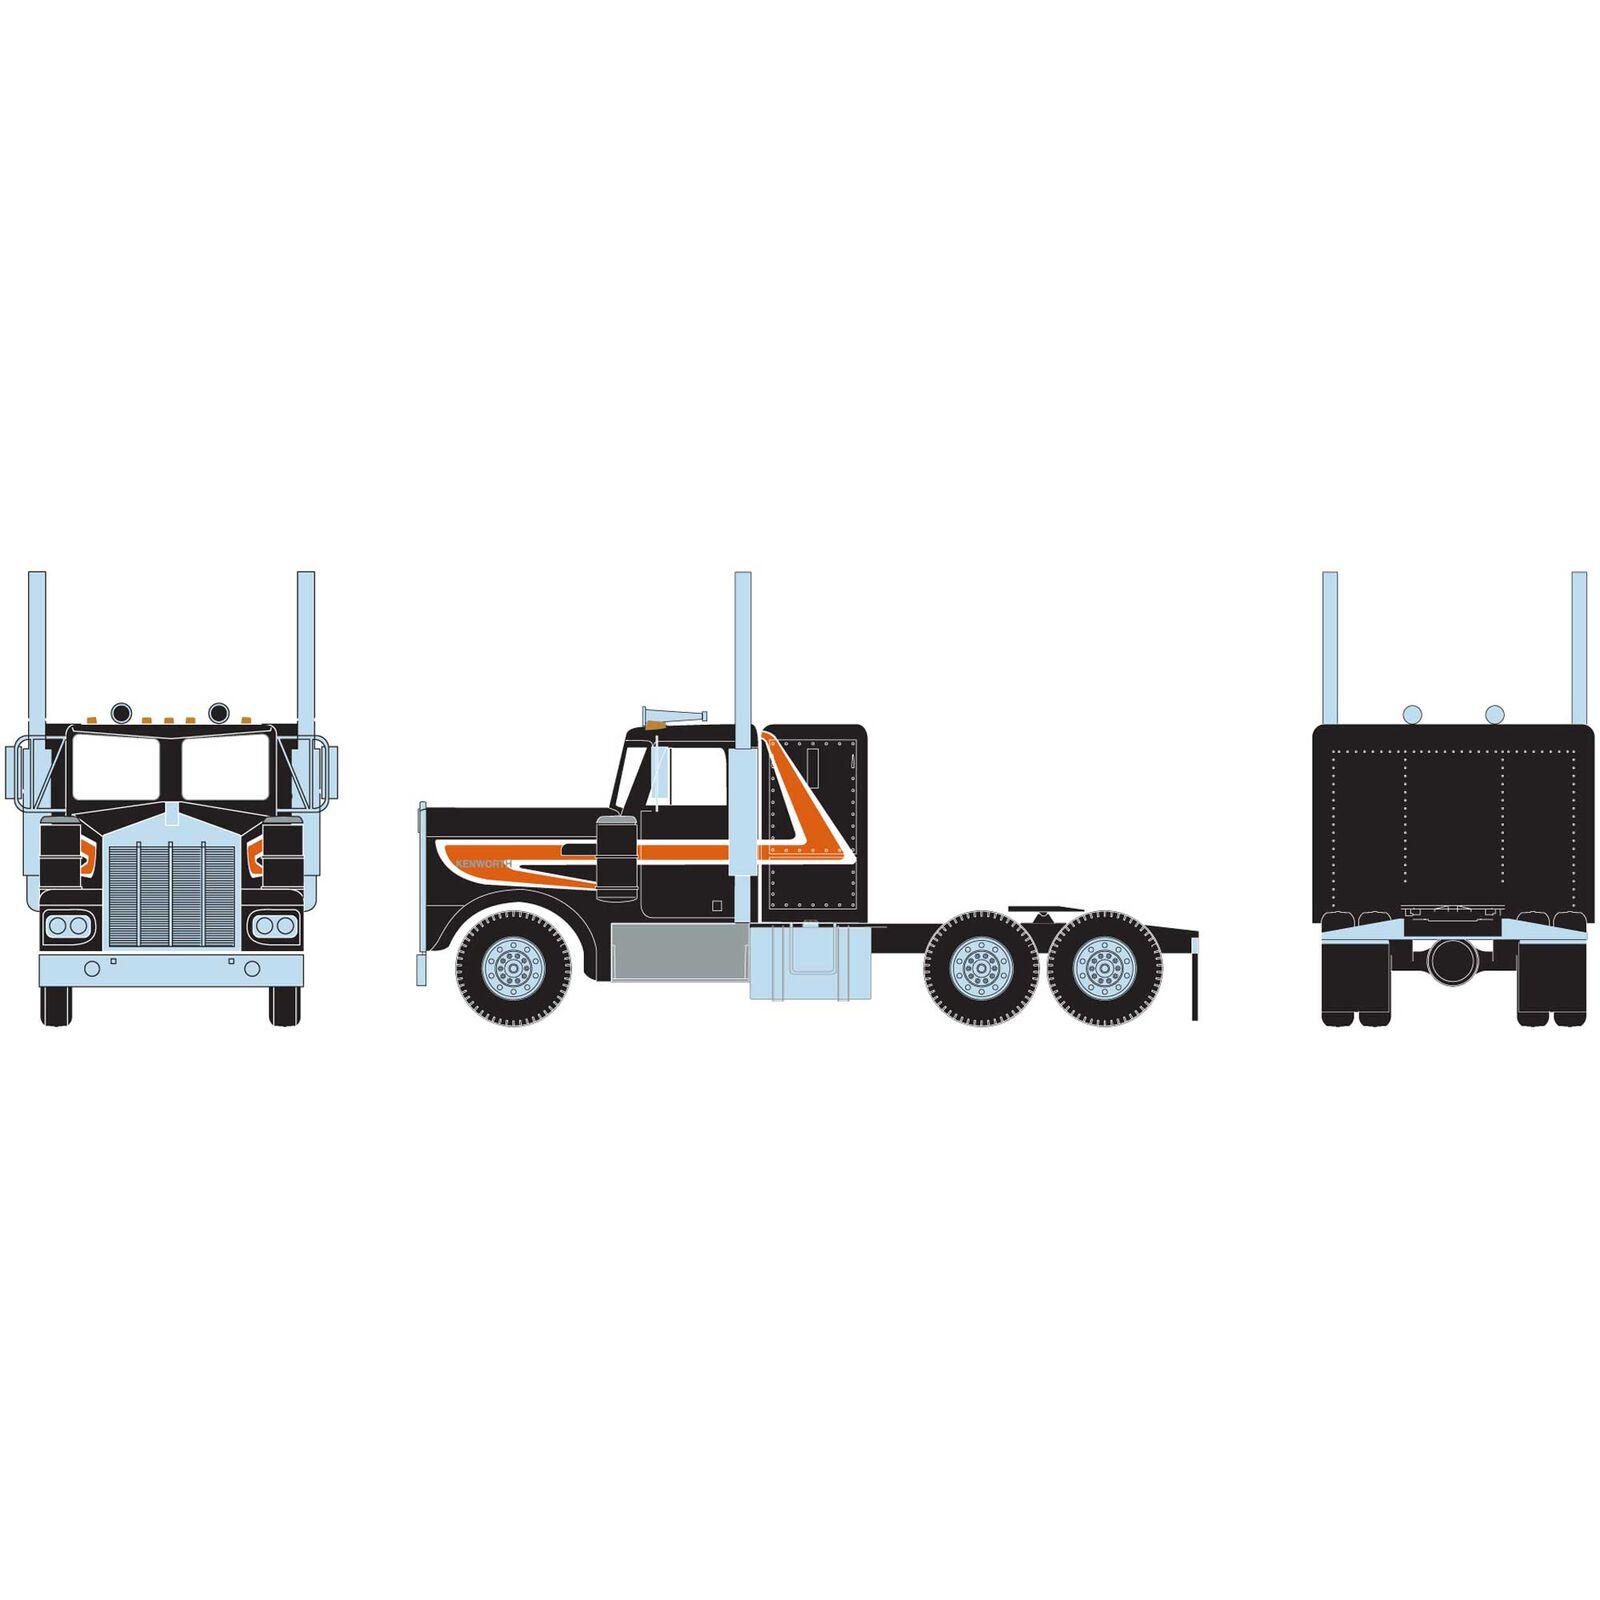 HO RTR KW Tractor, Orange & Black